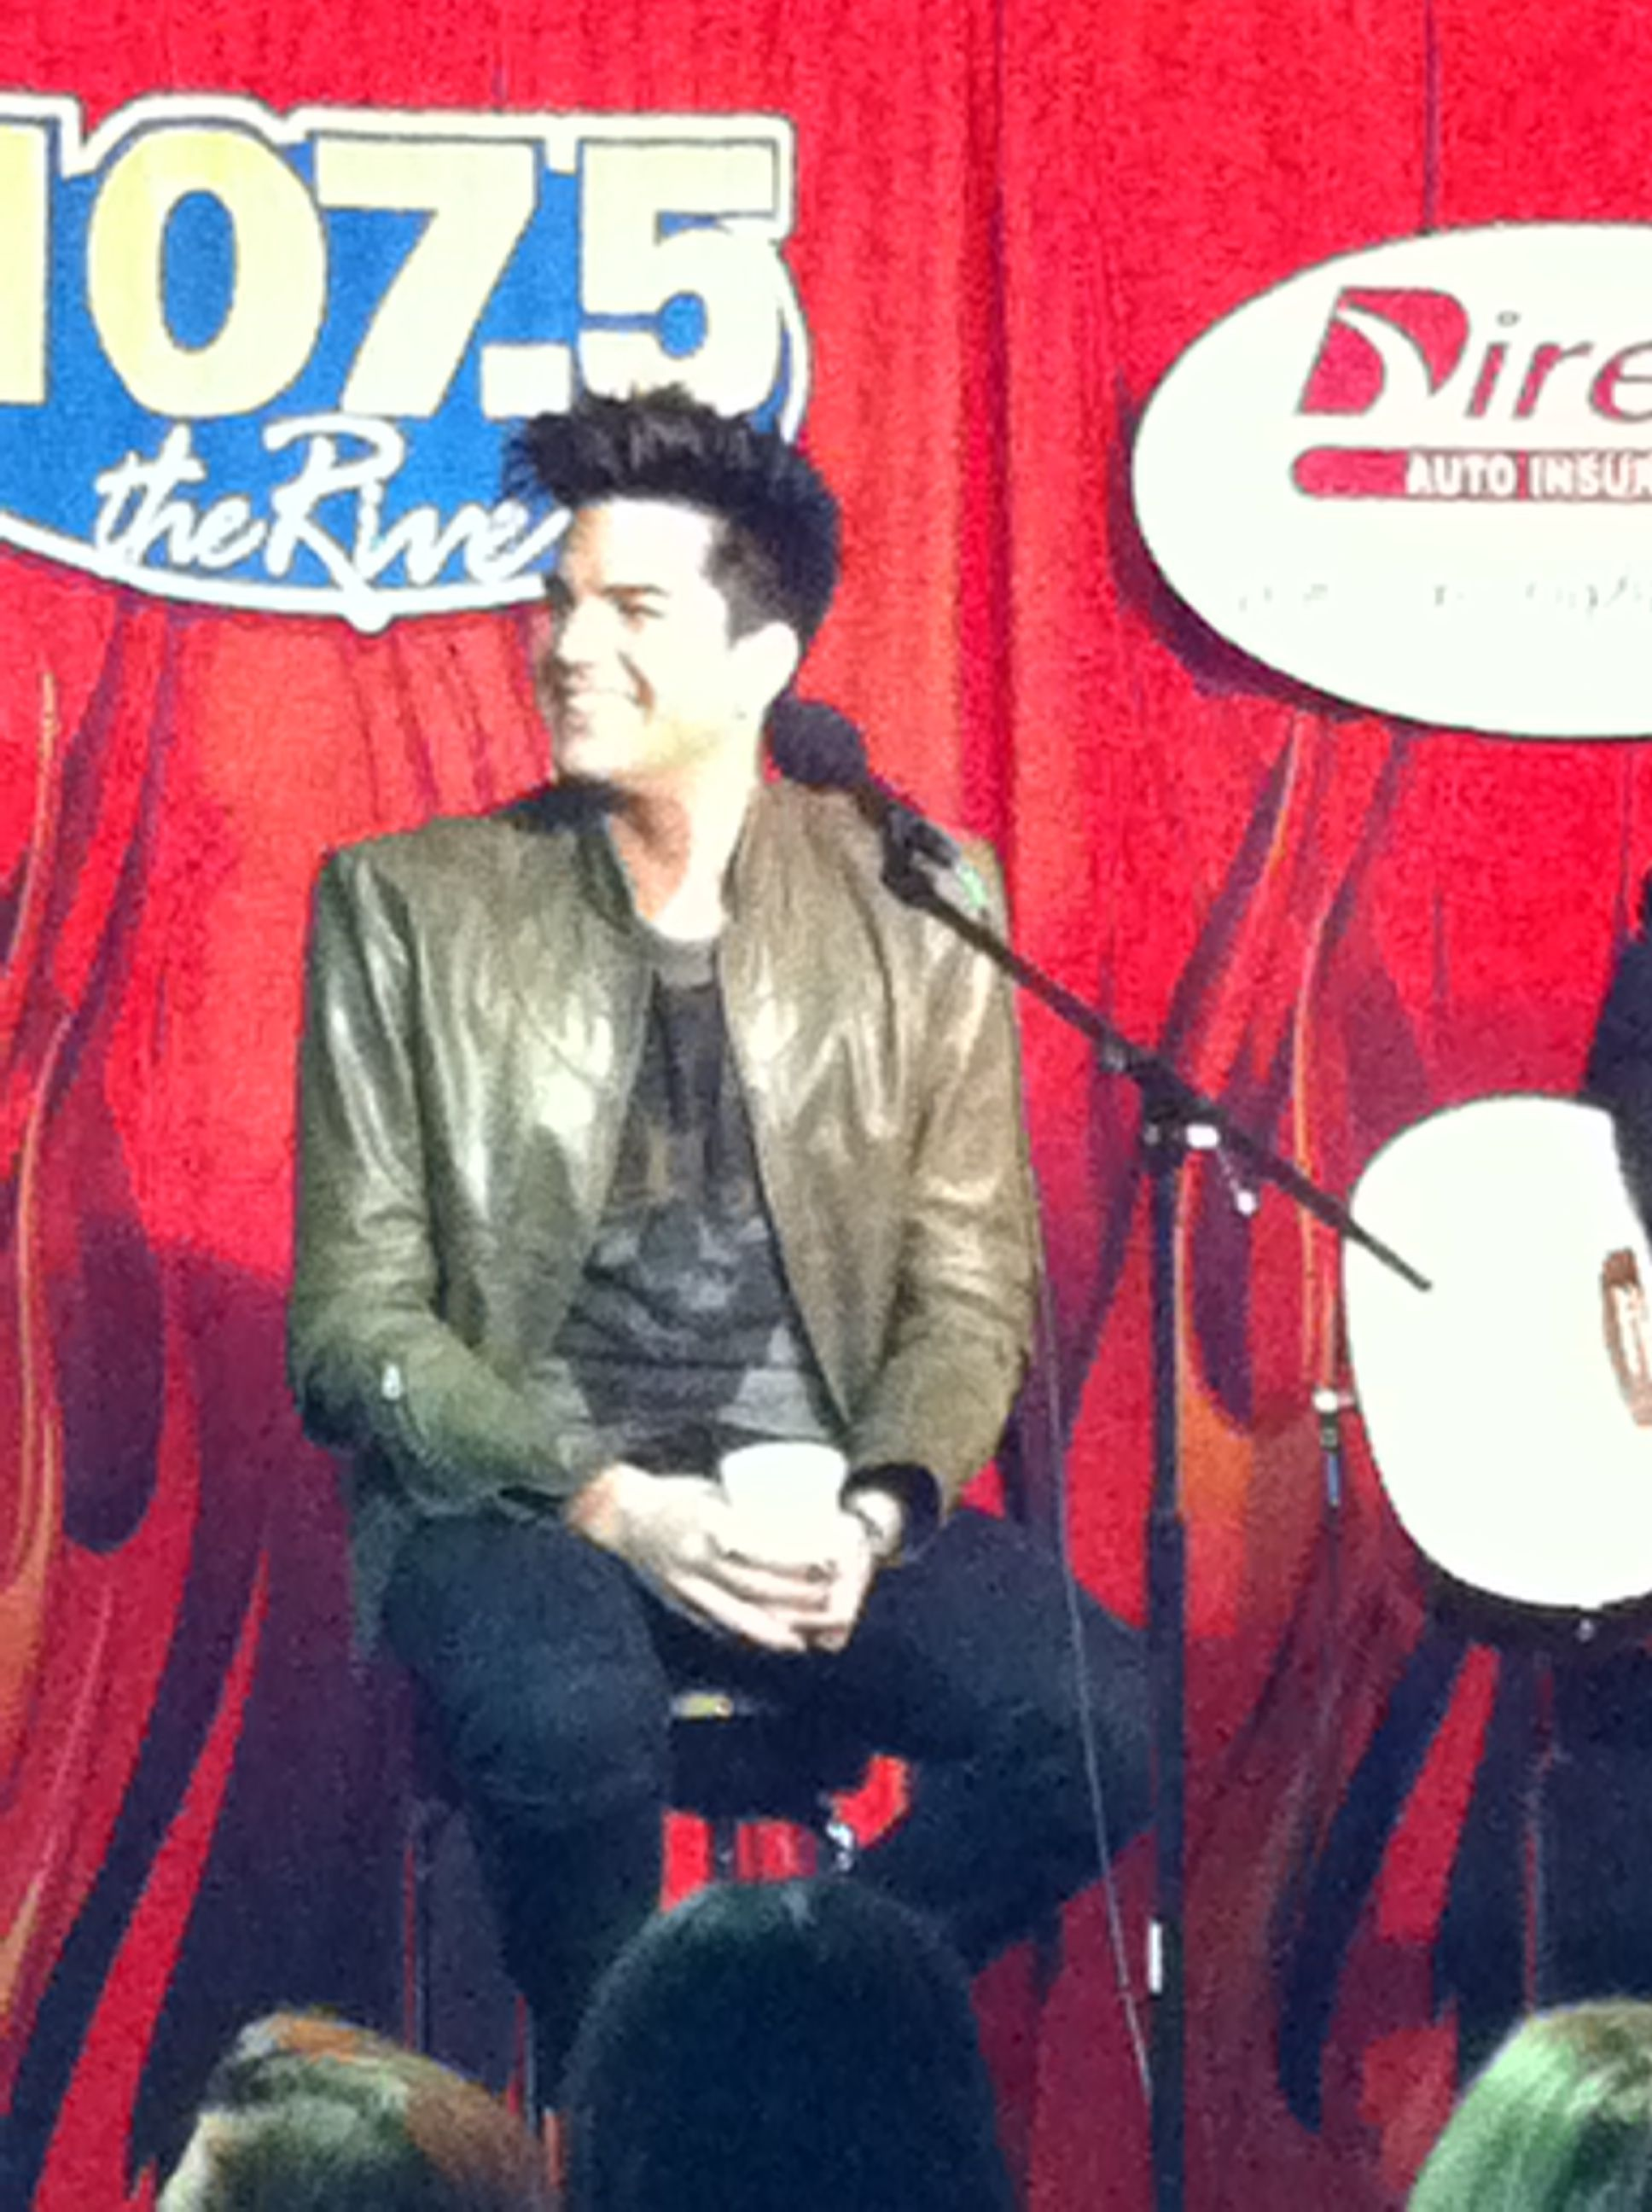 Adam Lambert At 1075 The River S Direct Auto Insurance Garage